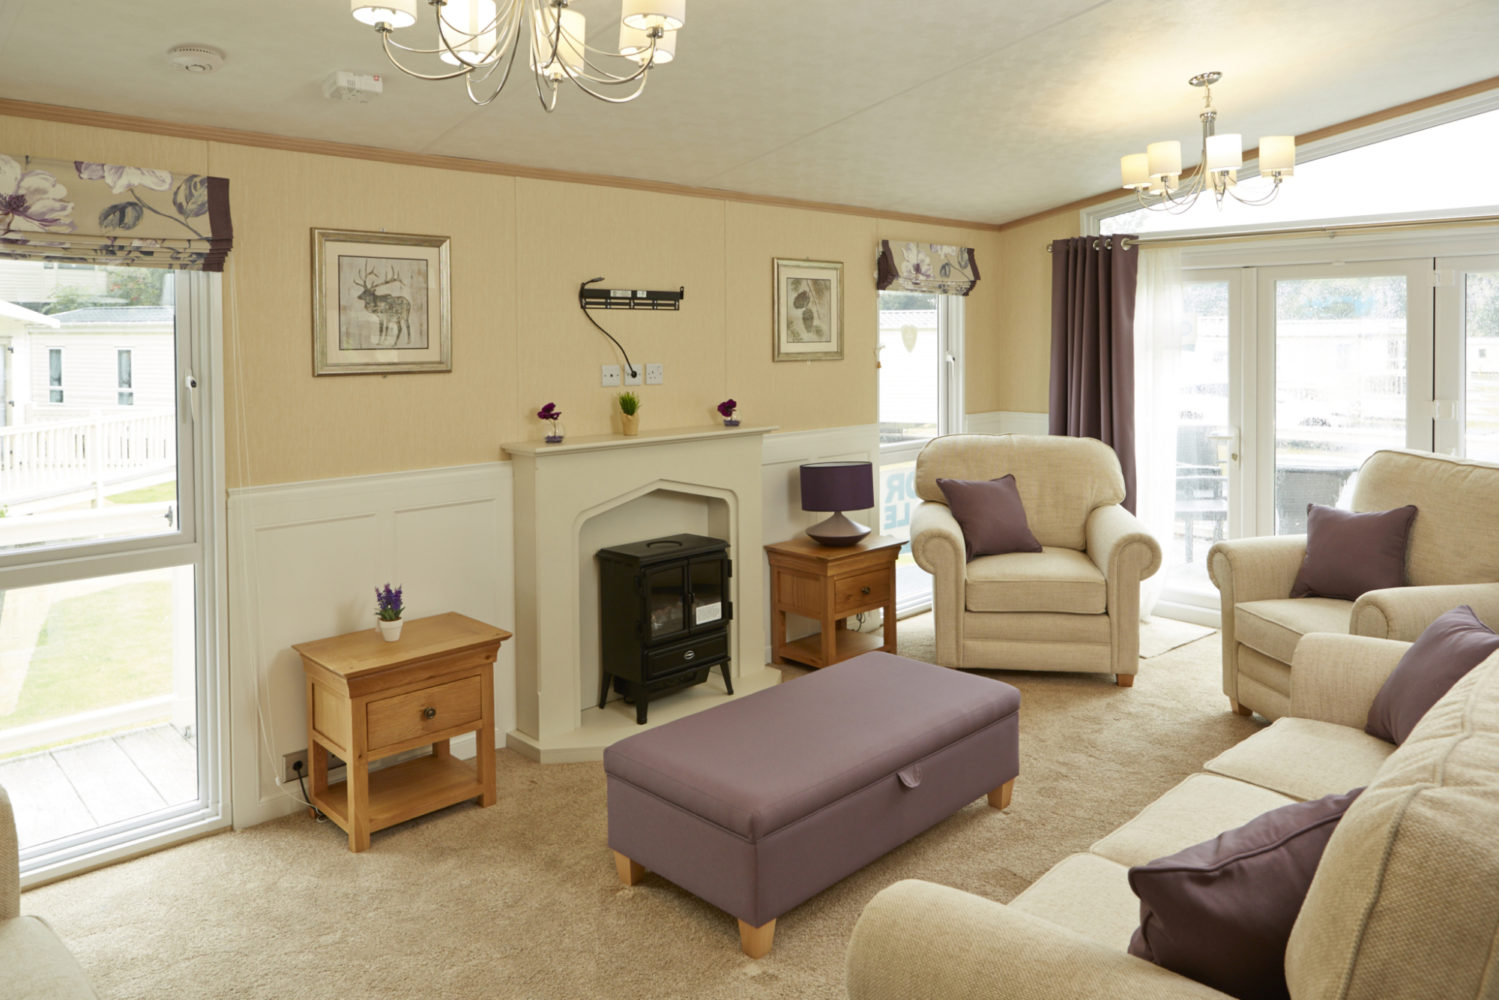 2016 pemberton glendale holiday home at malvern view park for Pemberton cabins